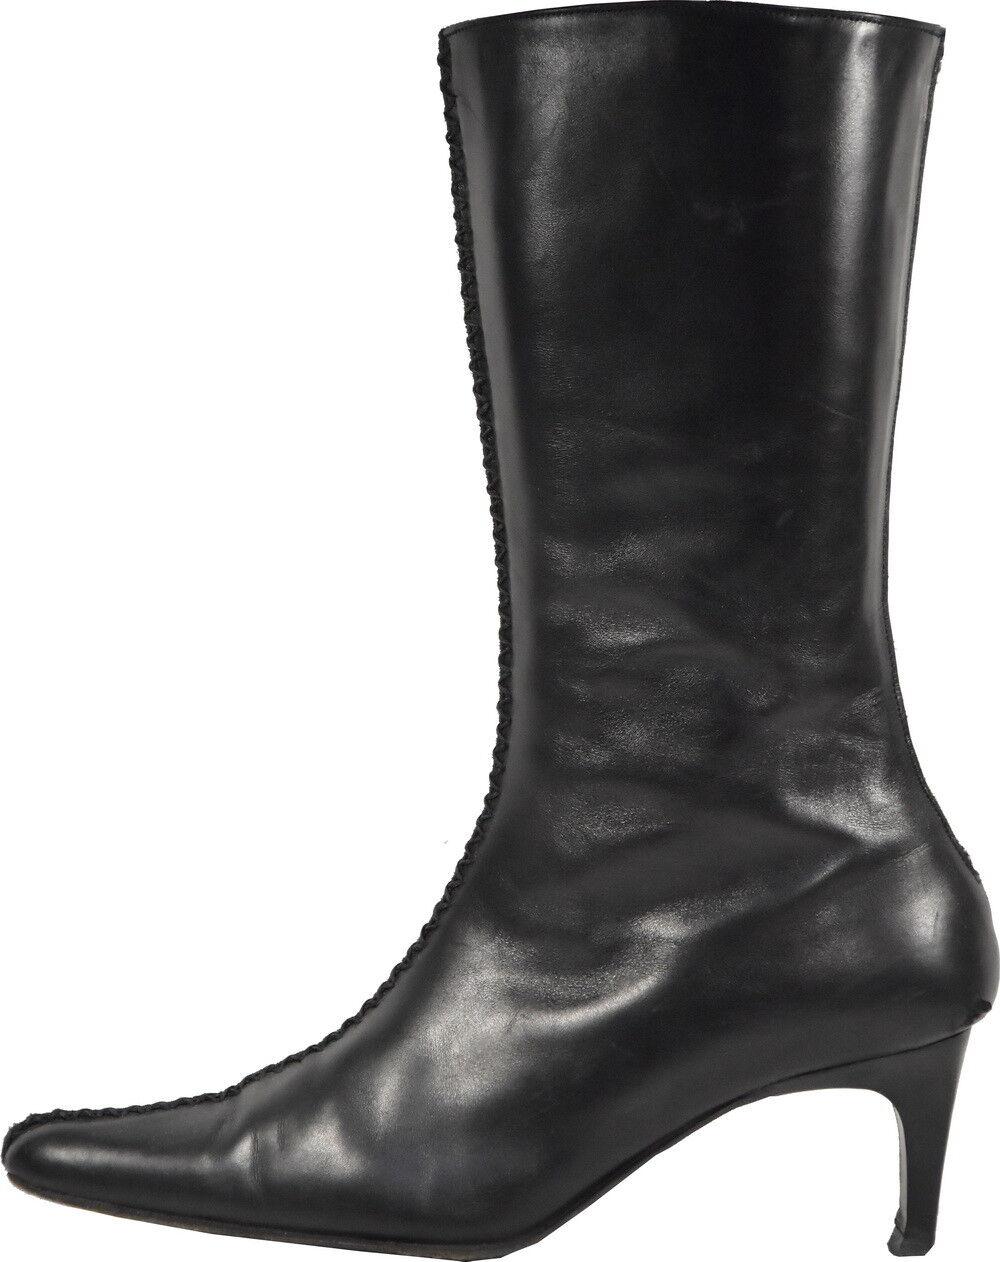 W021 PARALLELE PARALLELE PARALLELE botas A TALON negro T.37.5 UK 4.5 VALEUR  descuento